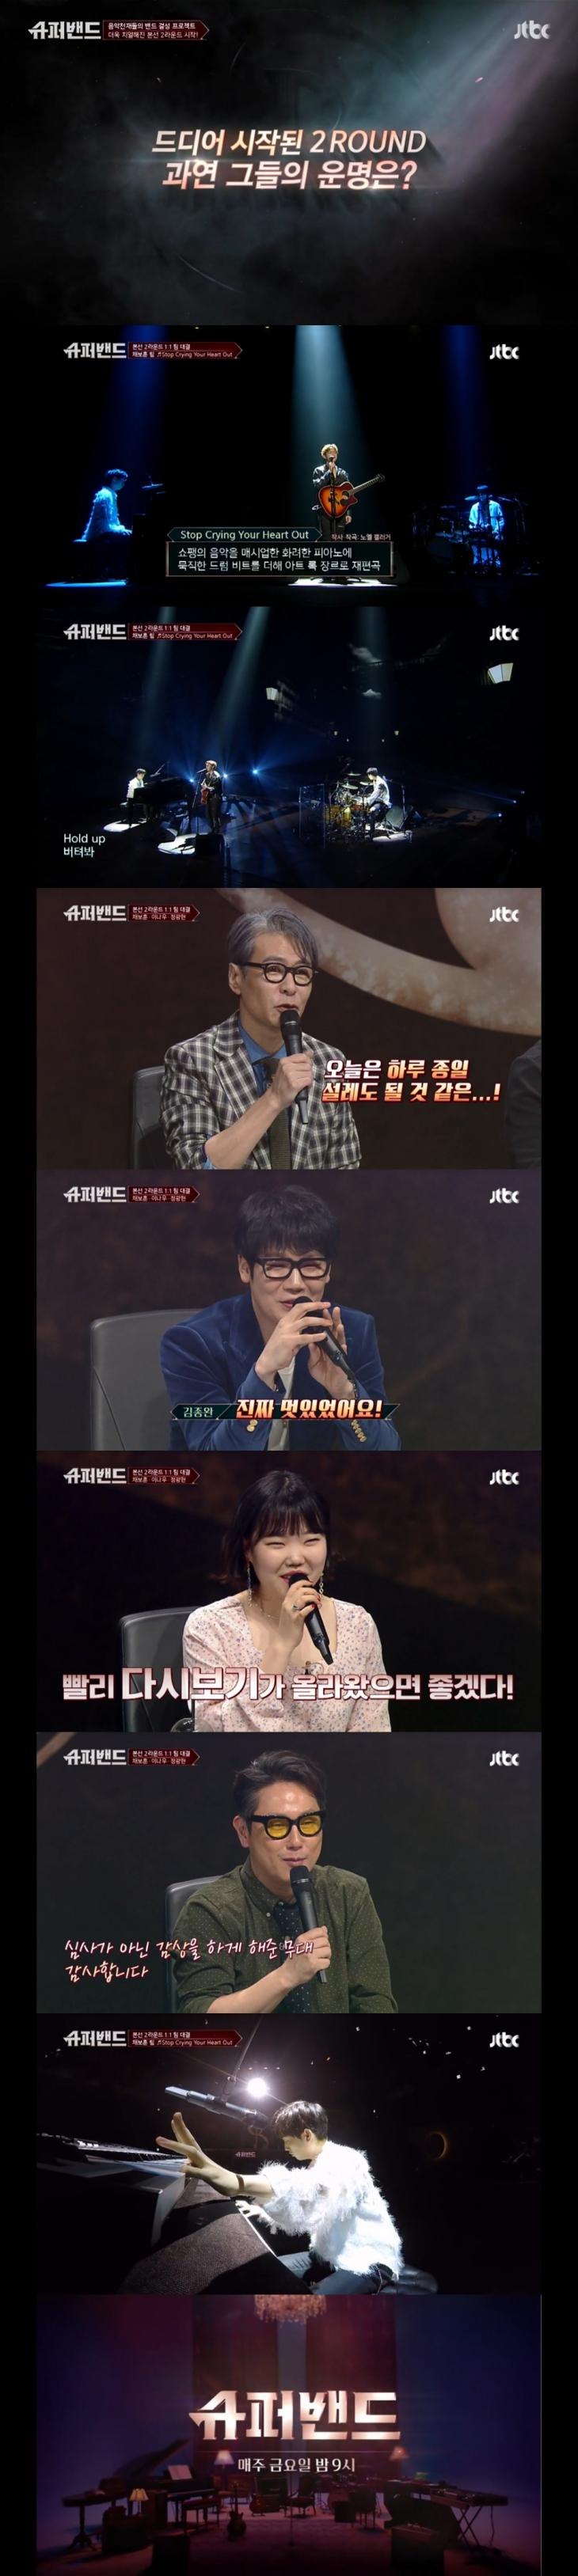 JTBC '슈퍼밴드'